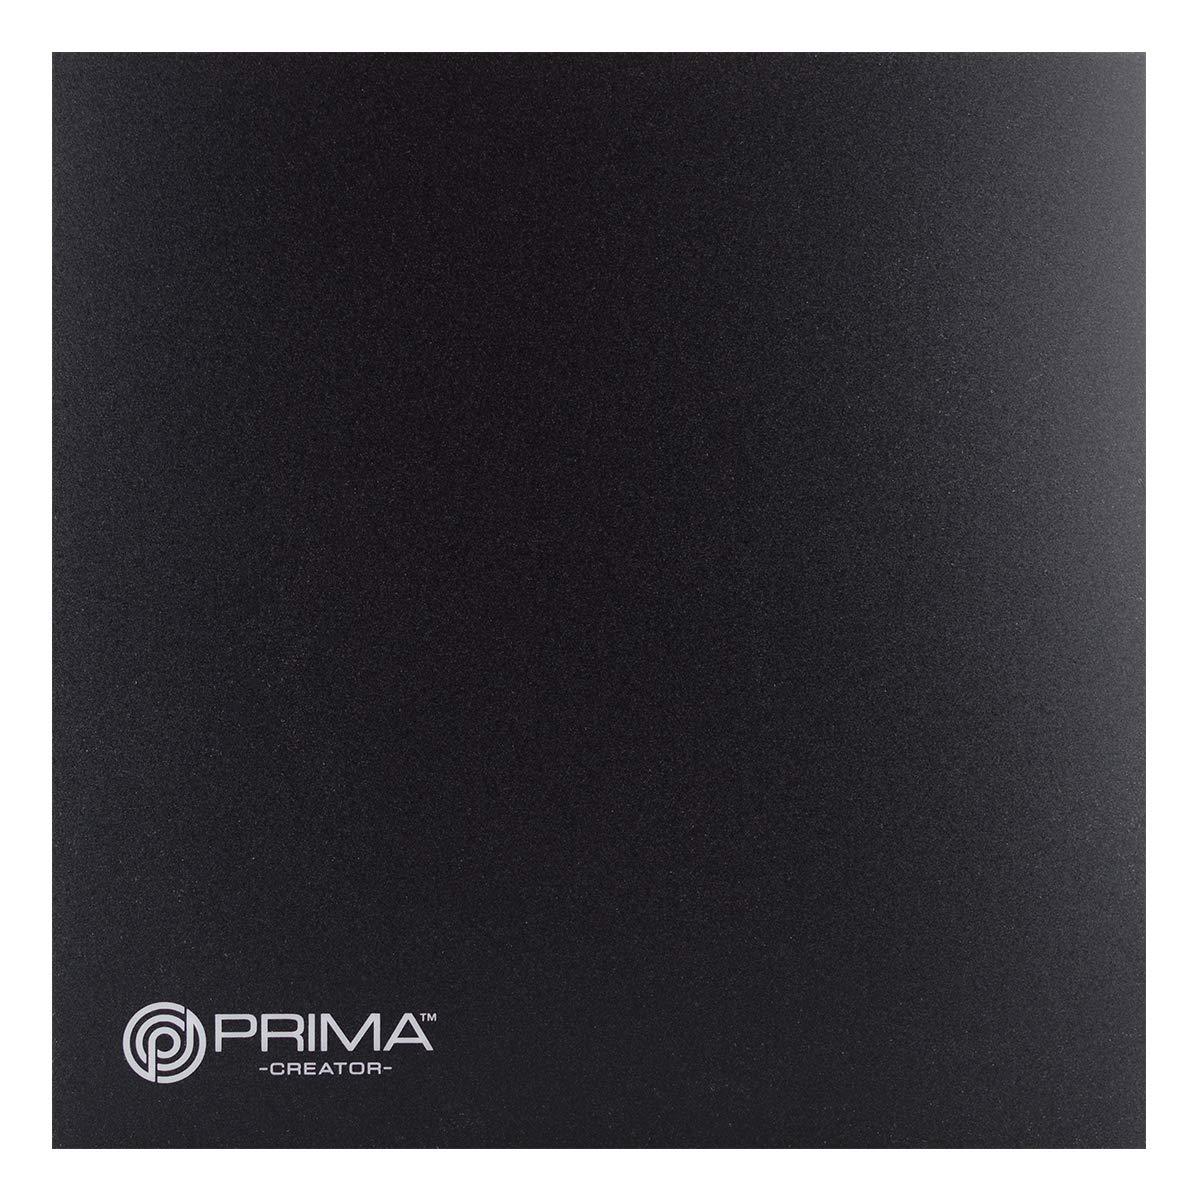 PrimaCreator BlackSheet 510 x 510 mm Foglio di superficie per stampanti 3D